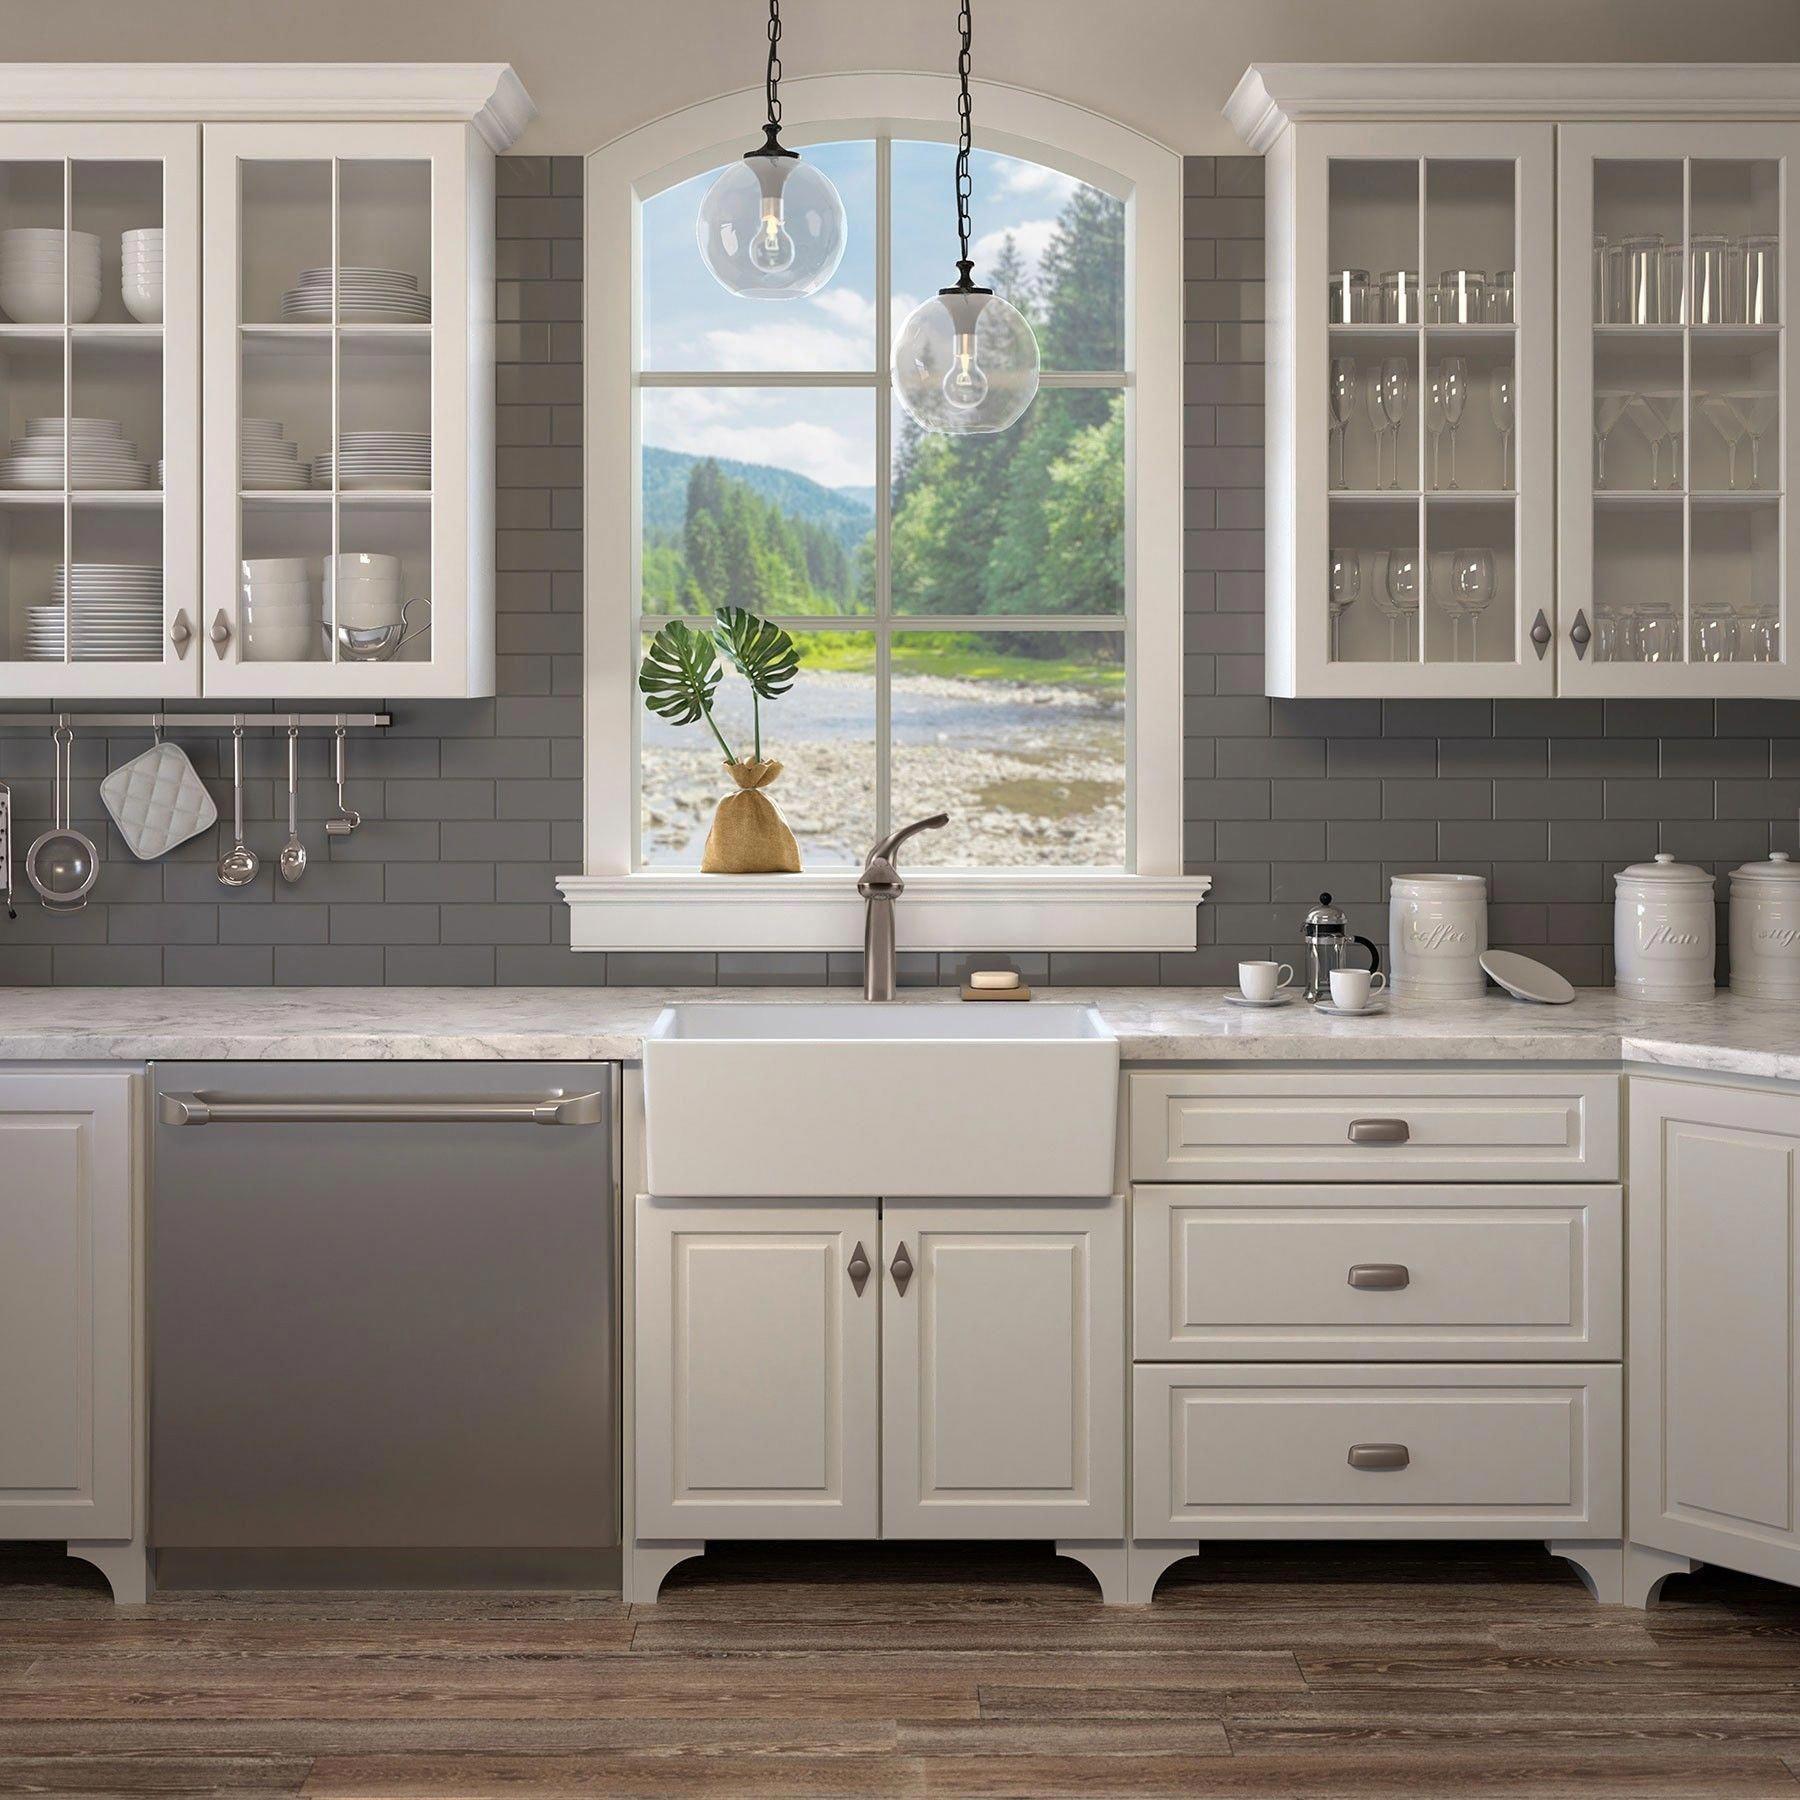 kitchen hardware Position